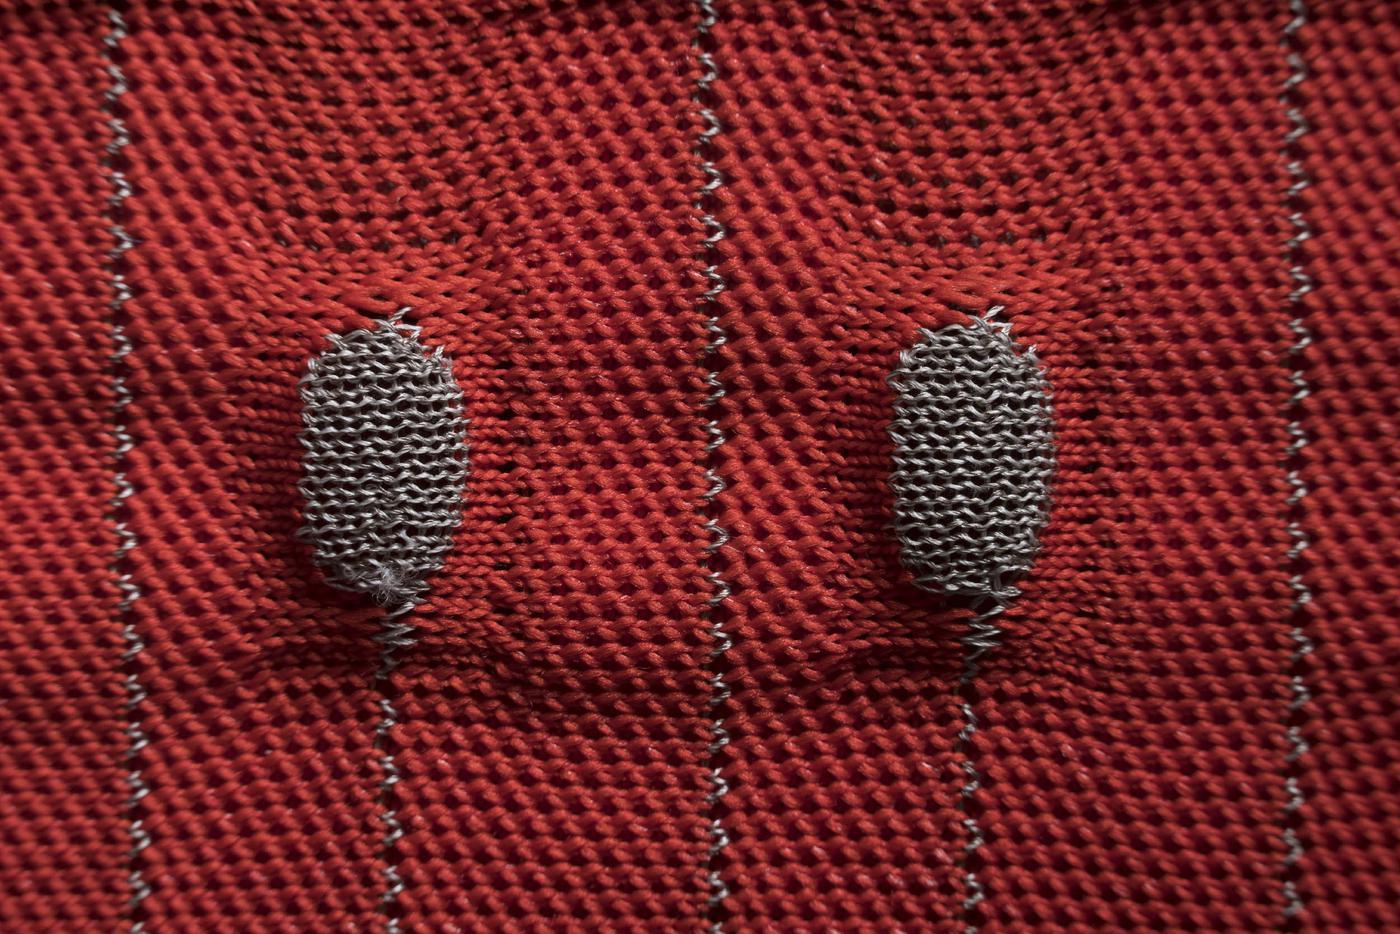 SensorKnits: Architecting textile sensors with machine knitting